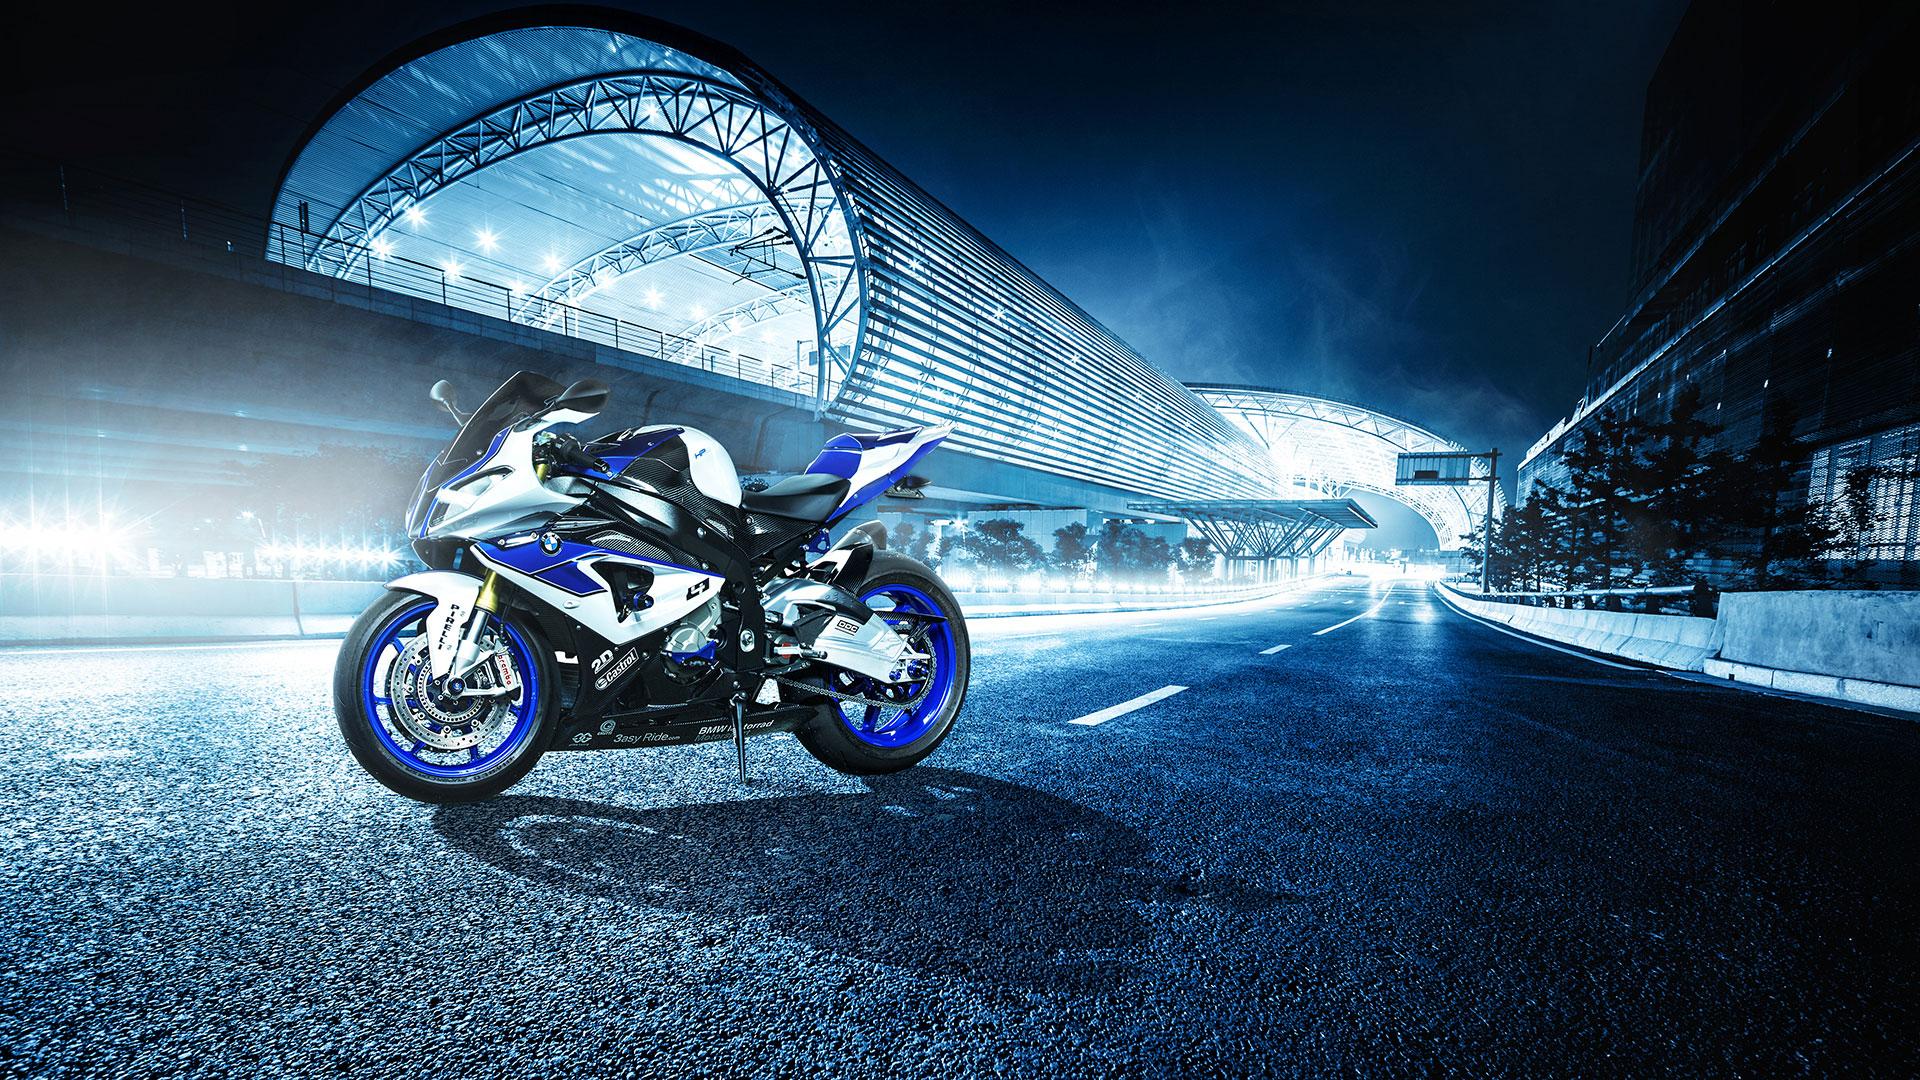 Image: BMW, motorcycle, white-blue, wheel, light, road, marking